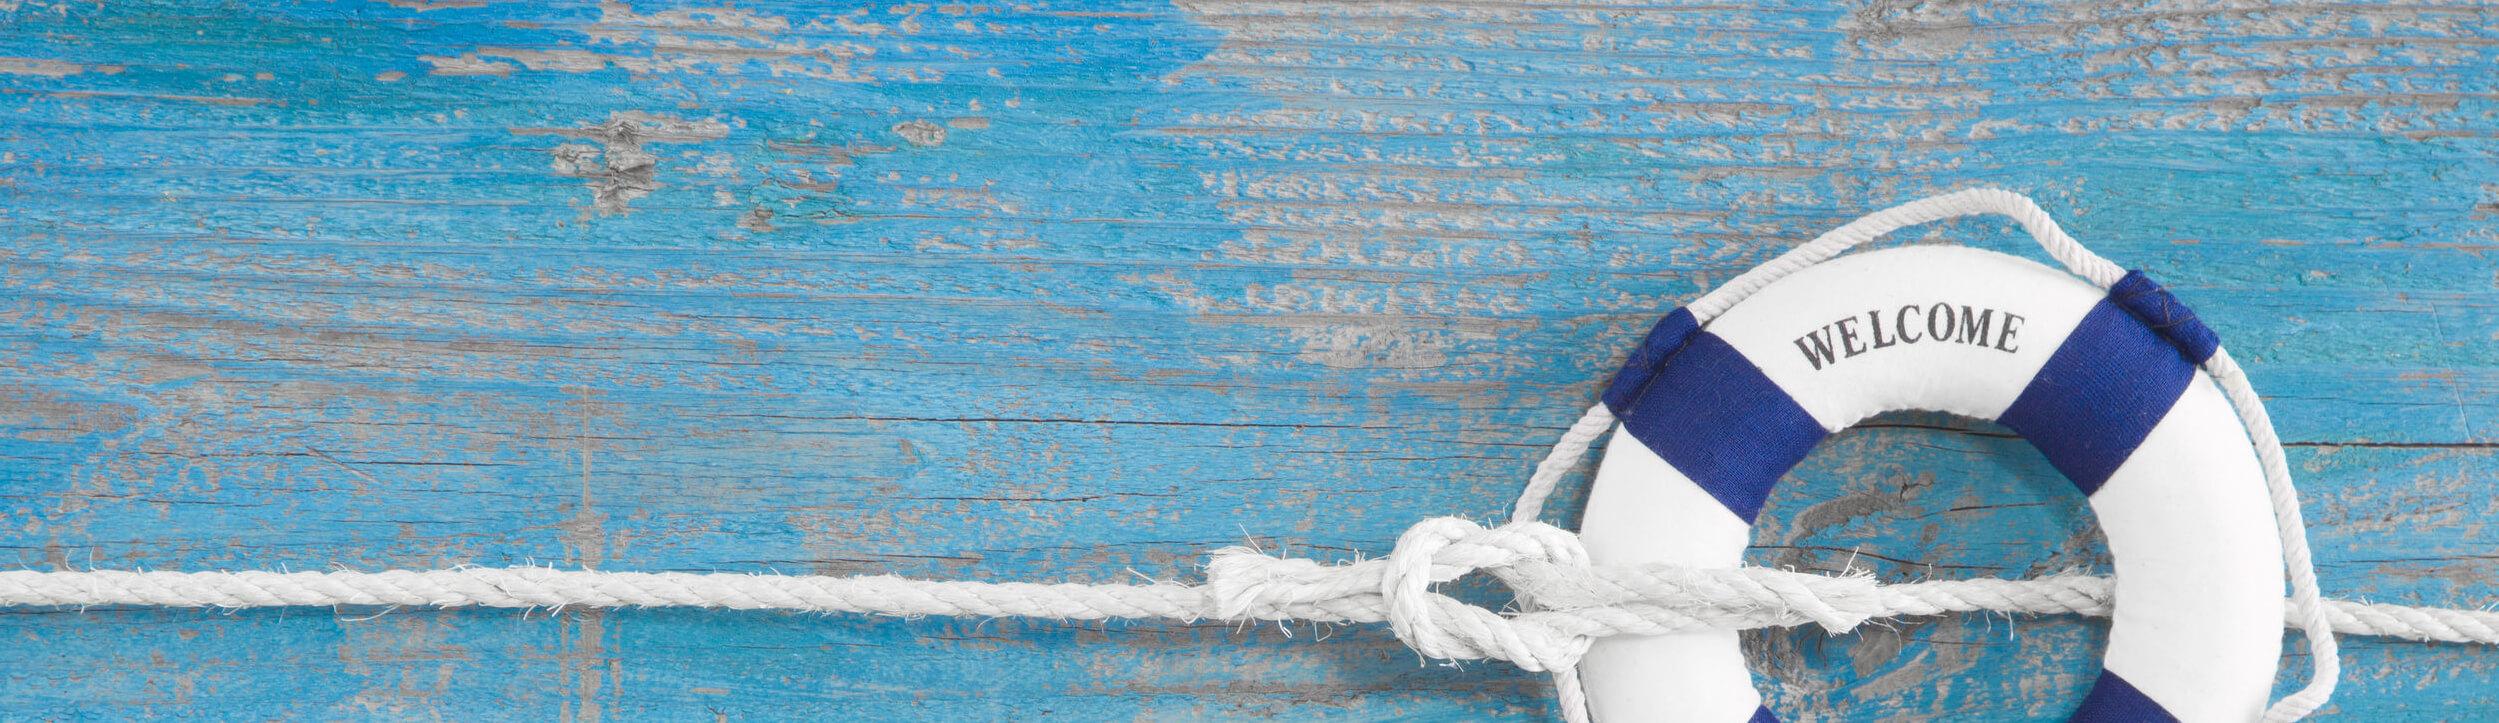 Seafarer Sailing Holidays